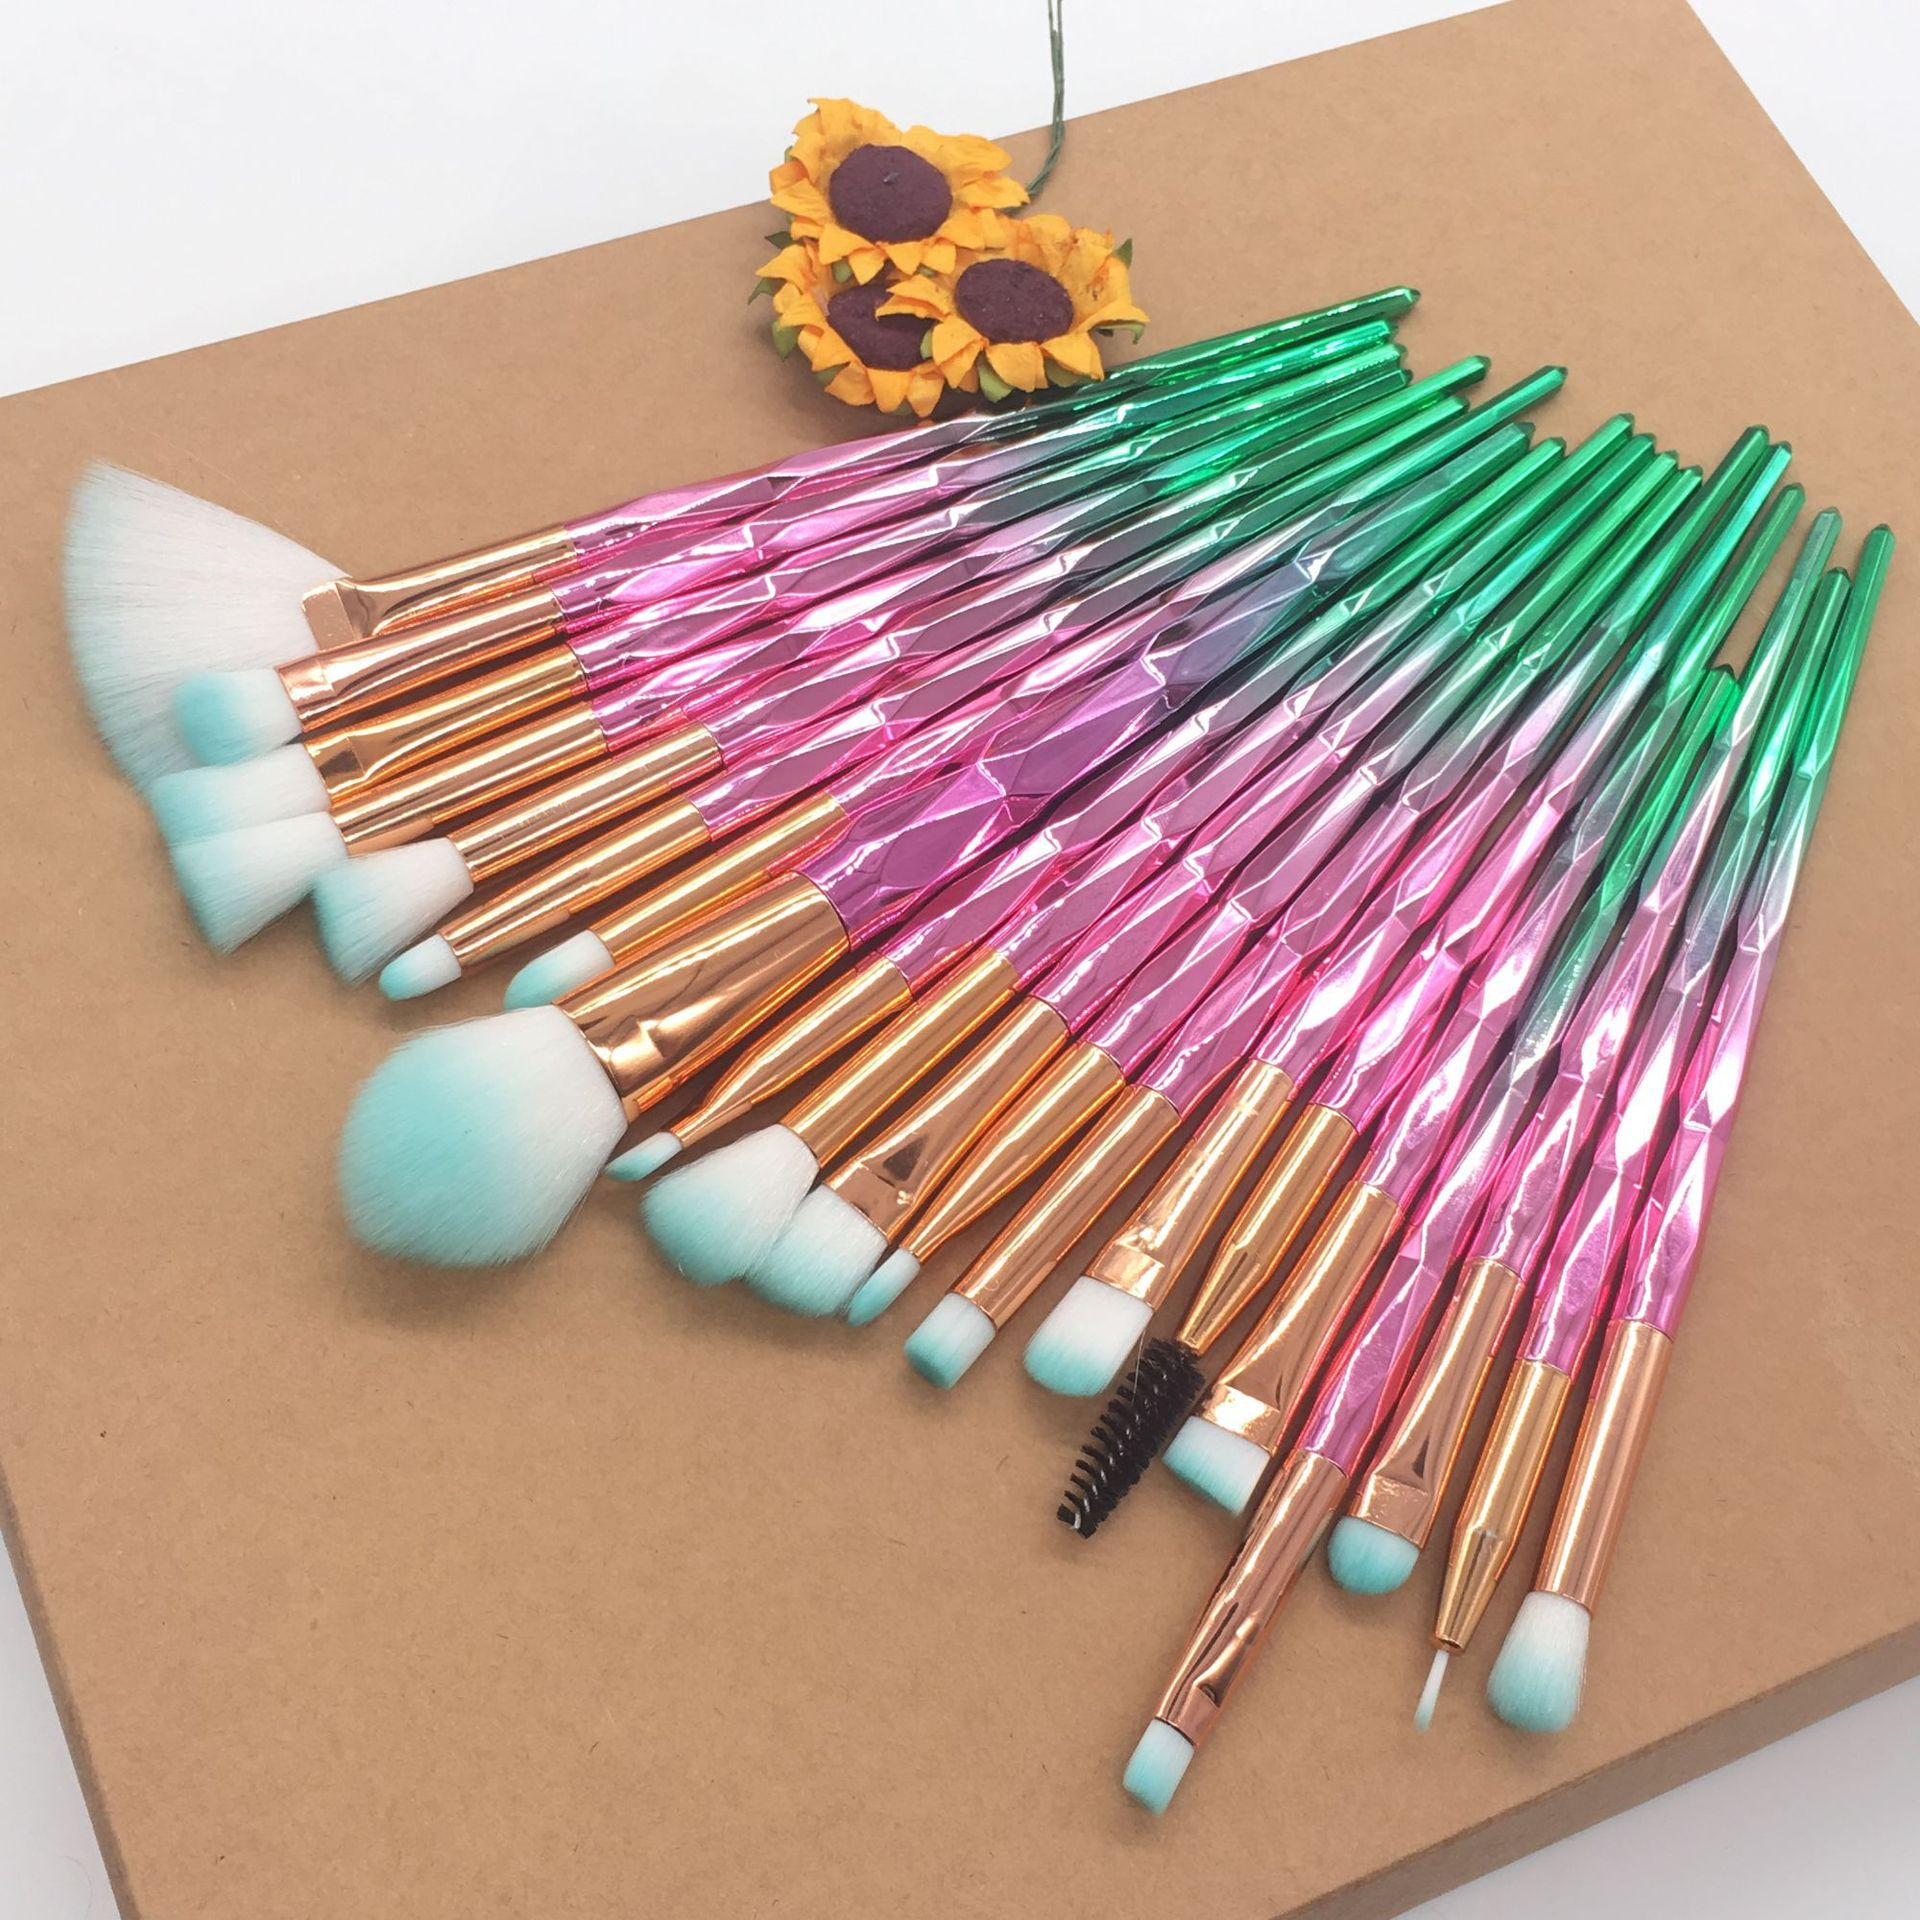 Professional 20pcs eye makeup brushes set available